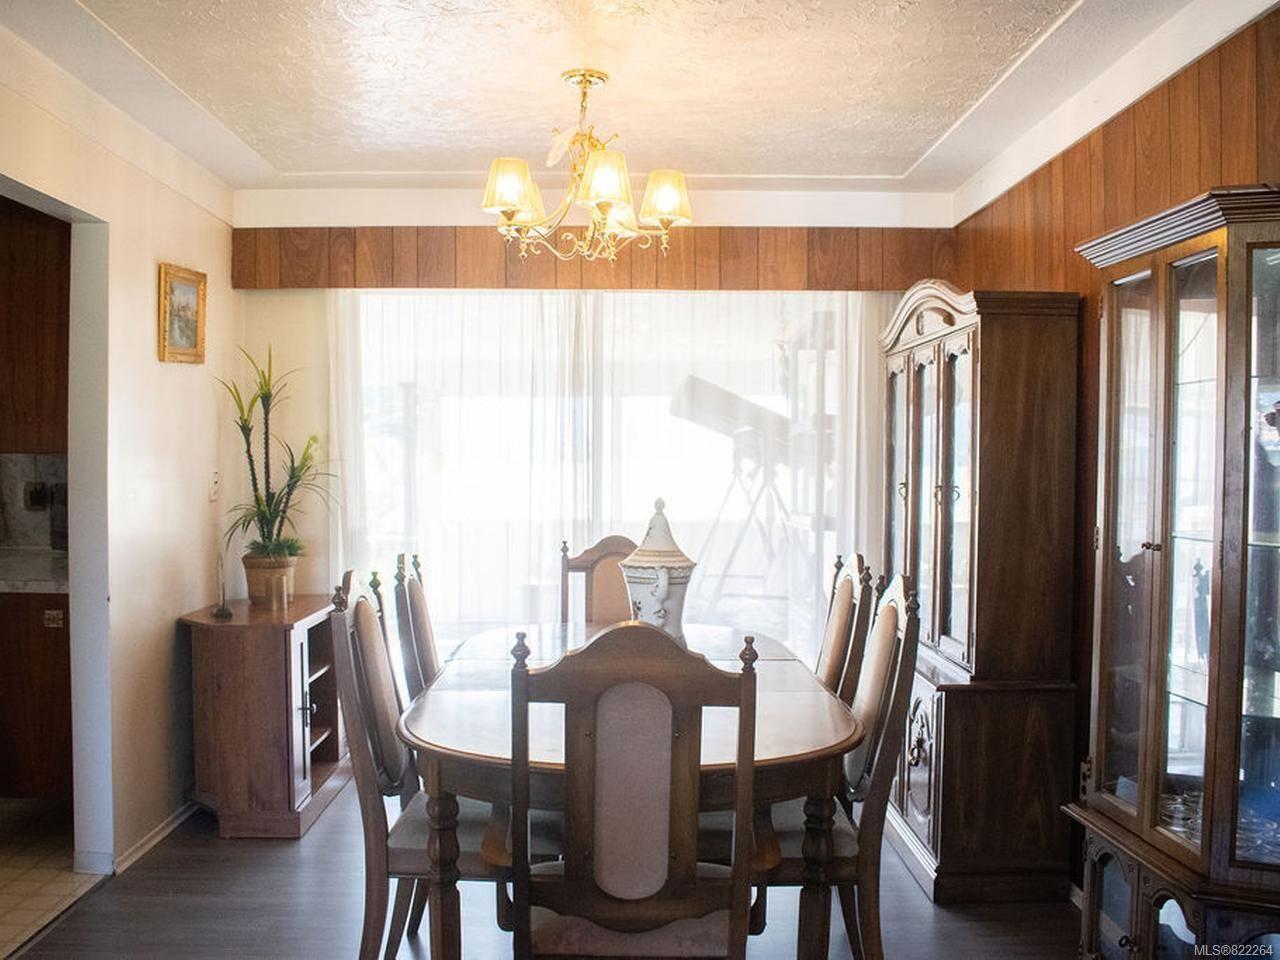 Photo 18: Photos: 4150 Rex Rd in PORT ALBERNI: PA Port Alberni House for sale (Port Alberni)  : MLS®# 822264